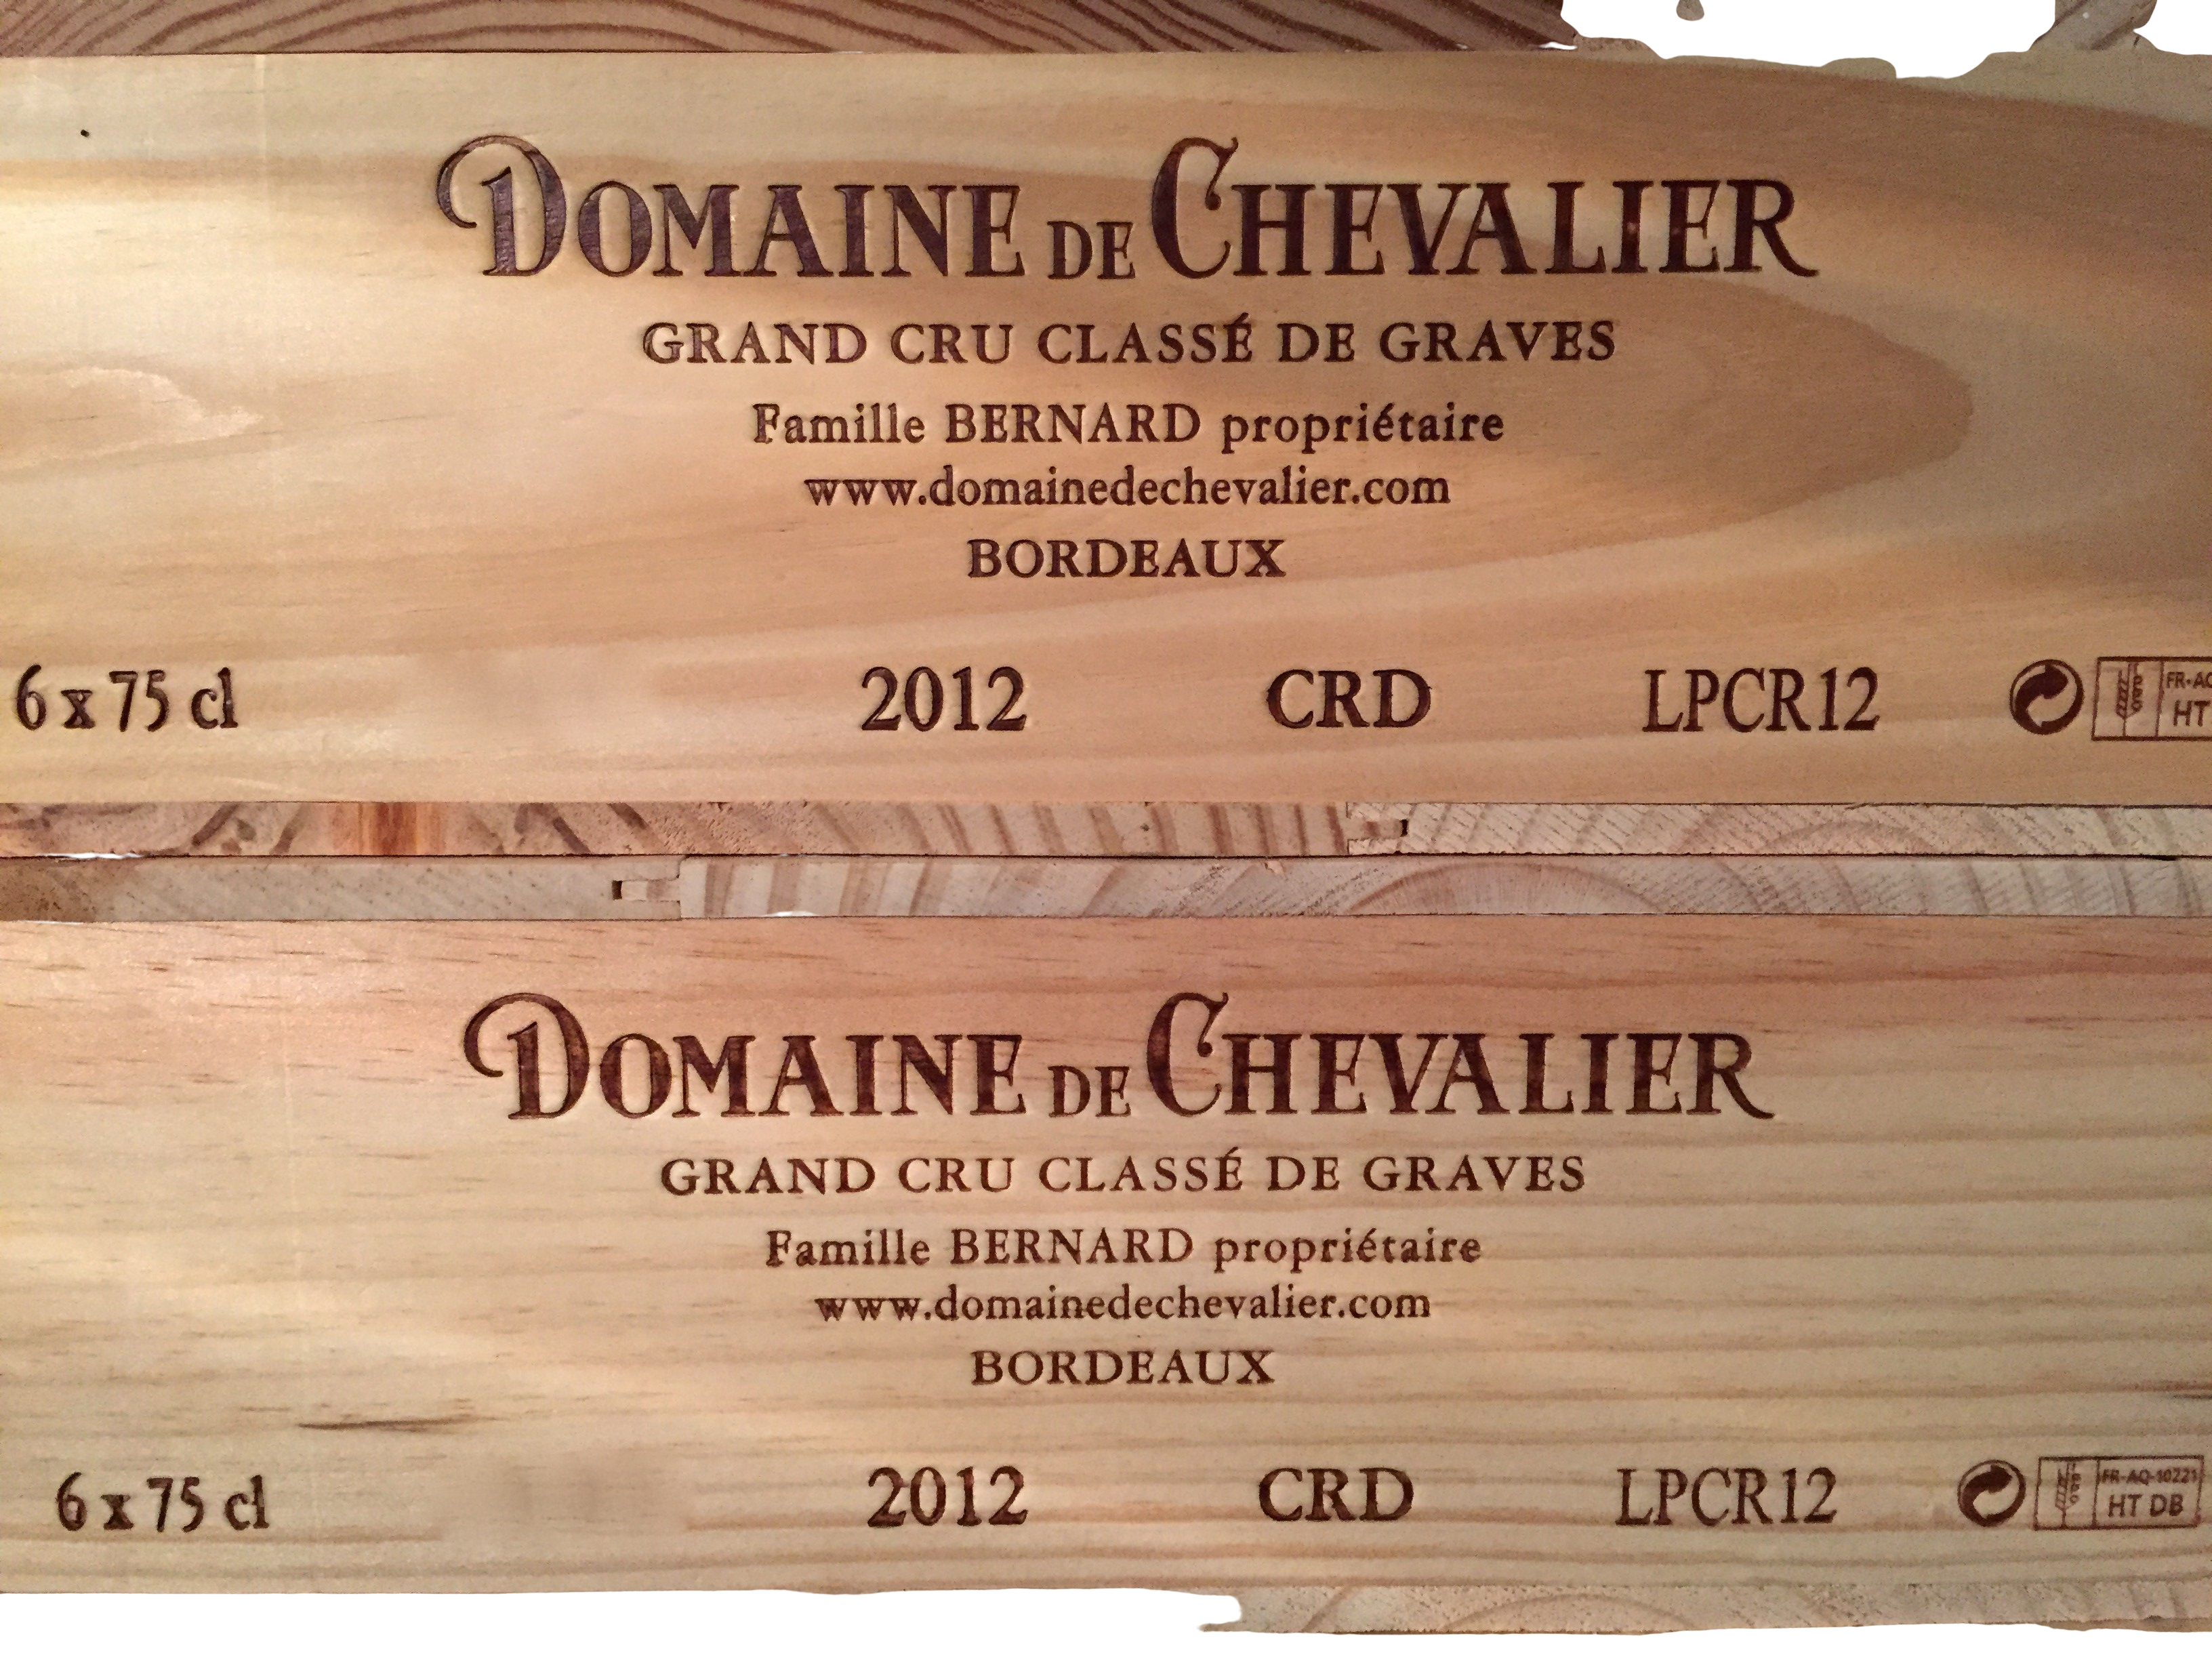 Domaine De Chevalier blanc 2012 (CBO 6)